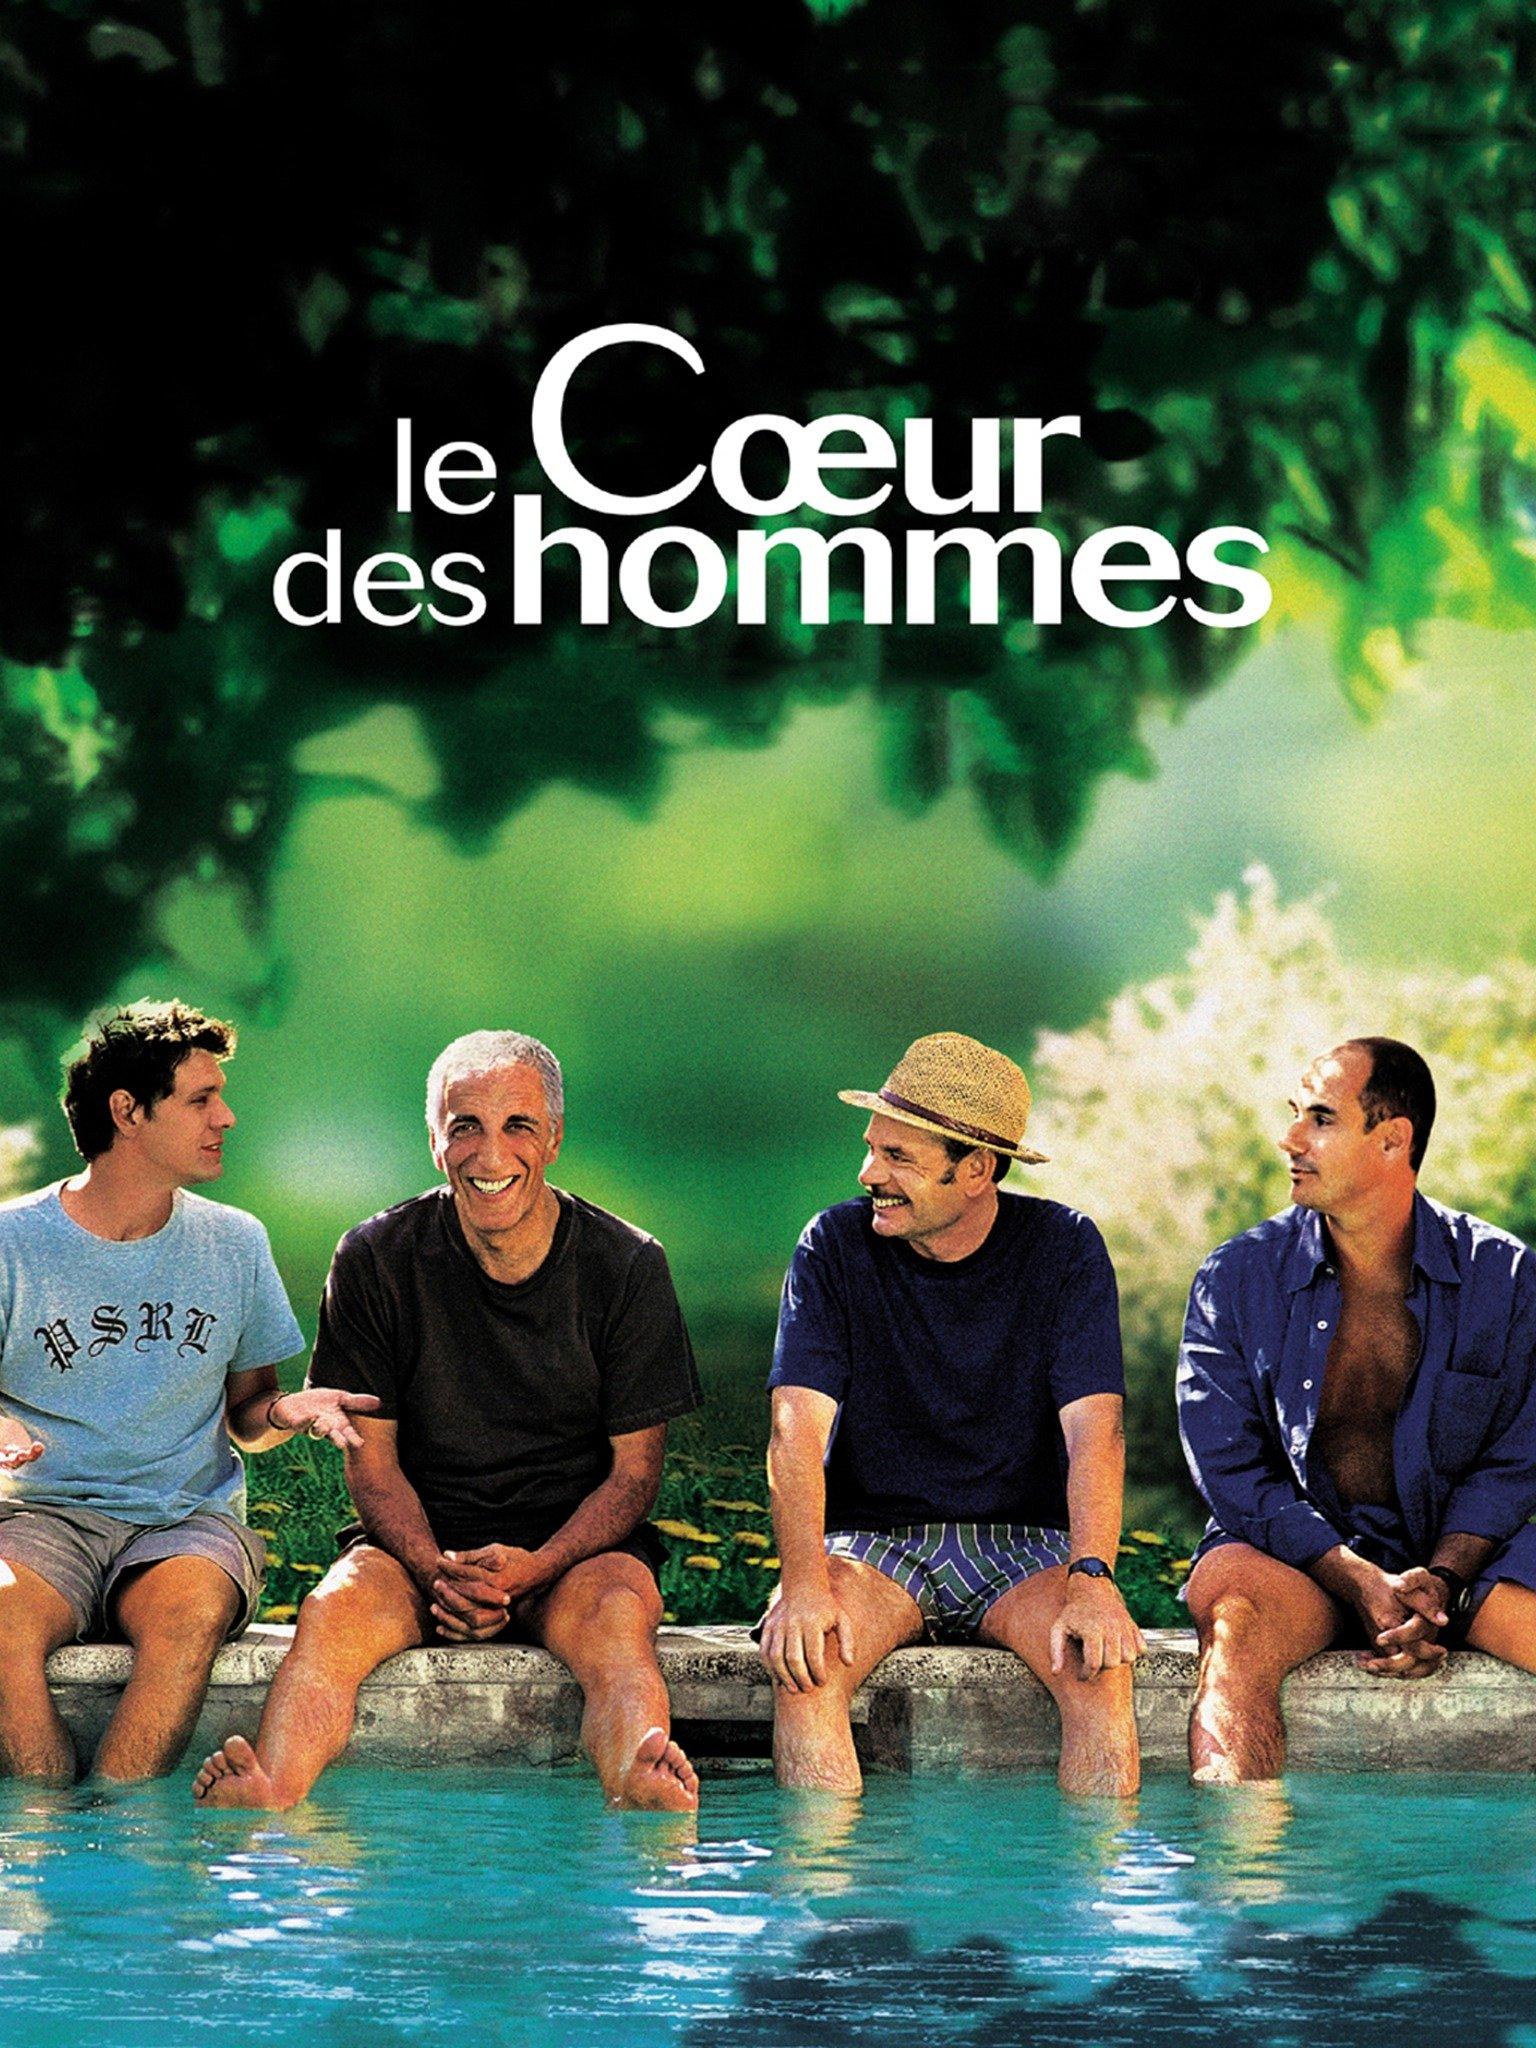 Le Coeur Des Hommes 3 Torrent : coeur, hommes, torrent, Coeur, Hommes, (2003), Rotten, Tomatoes